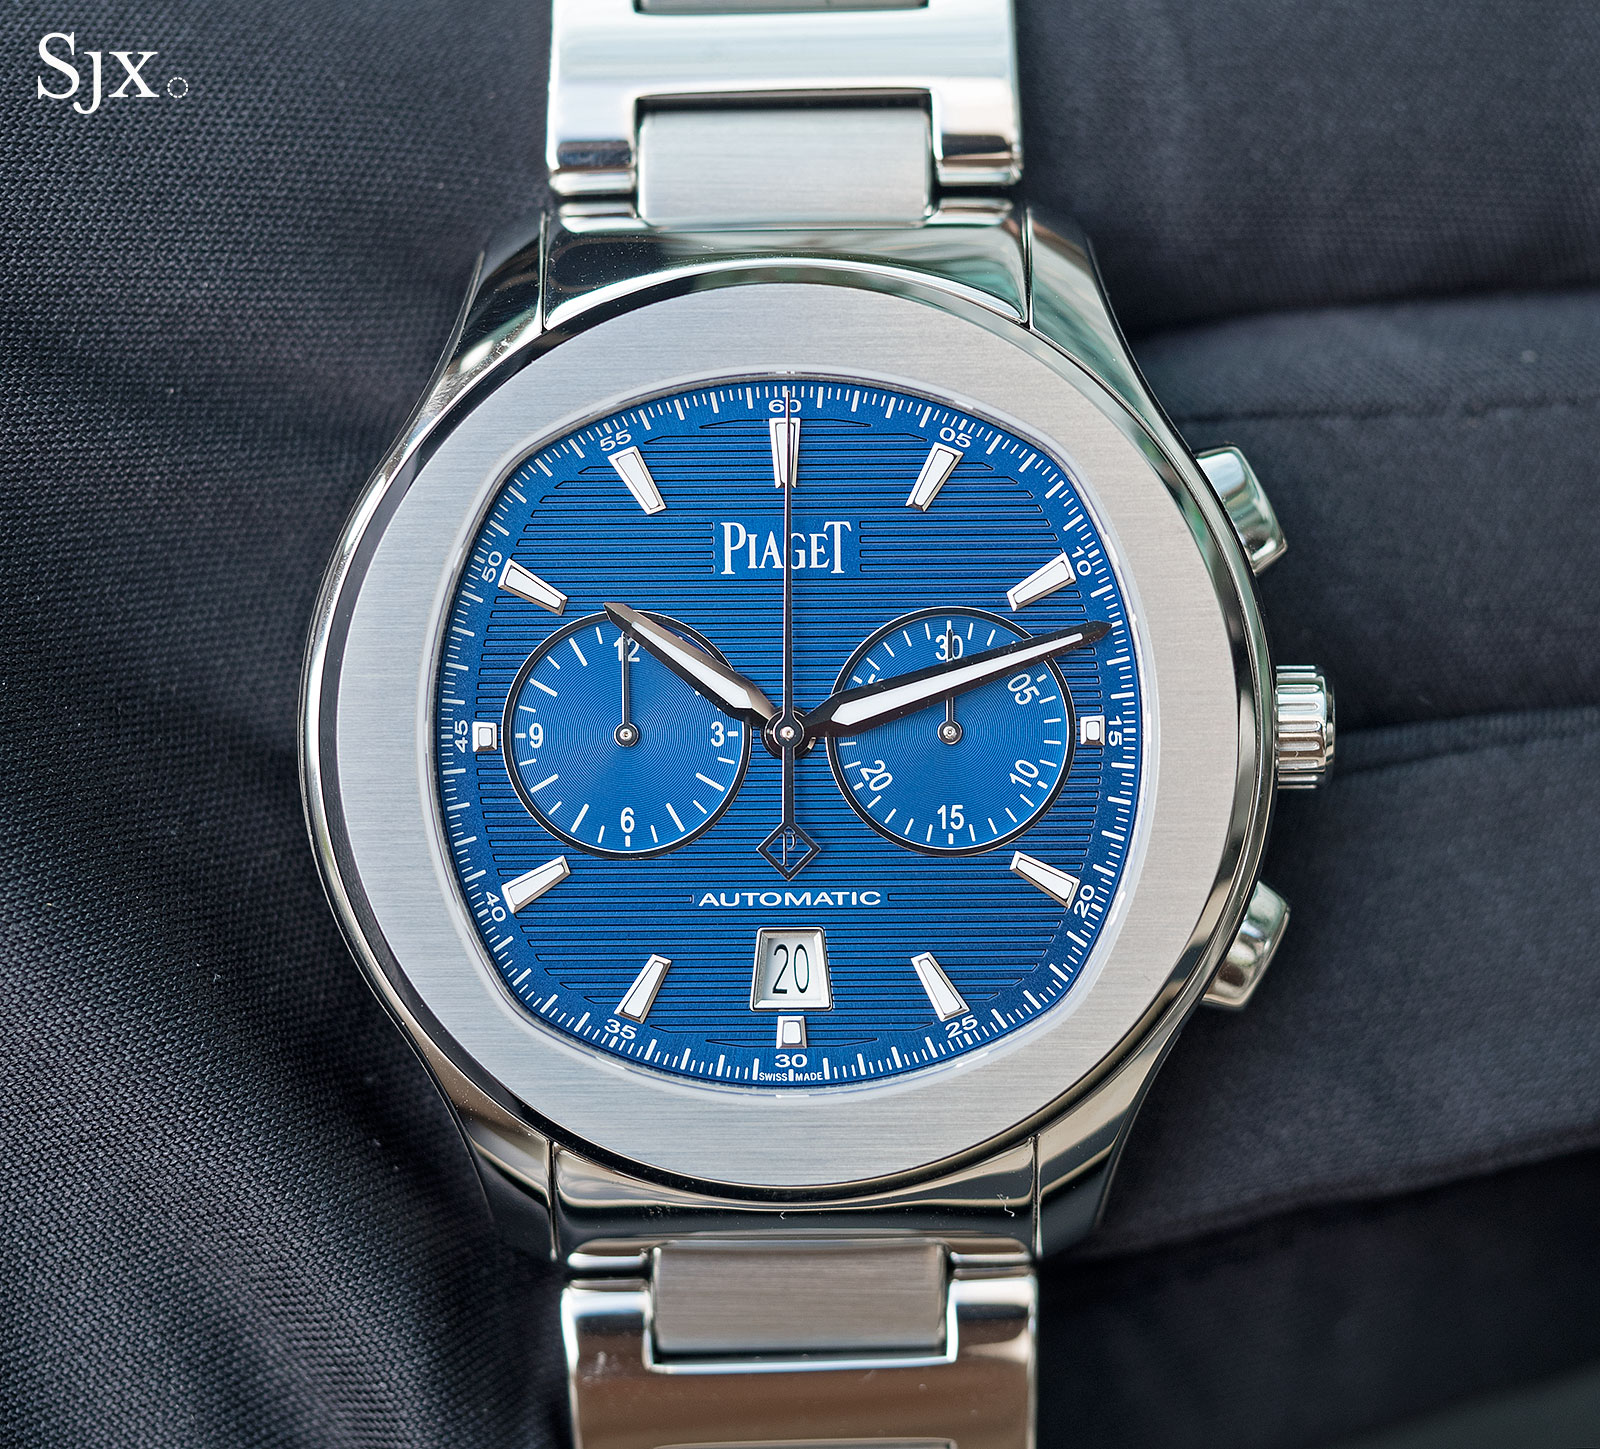 Piaget Polo S Chronograph 4